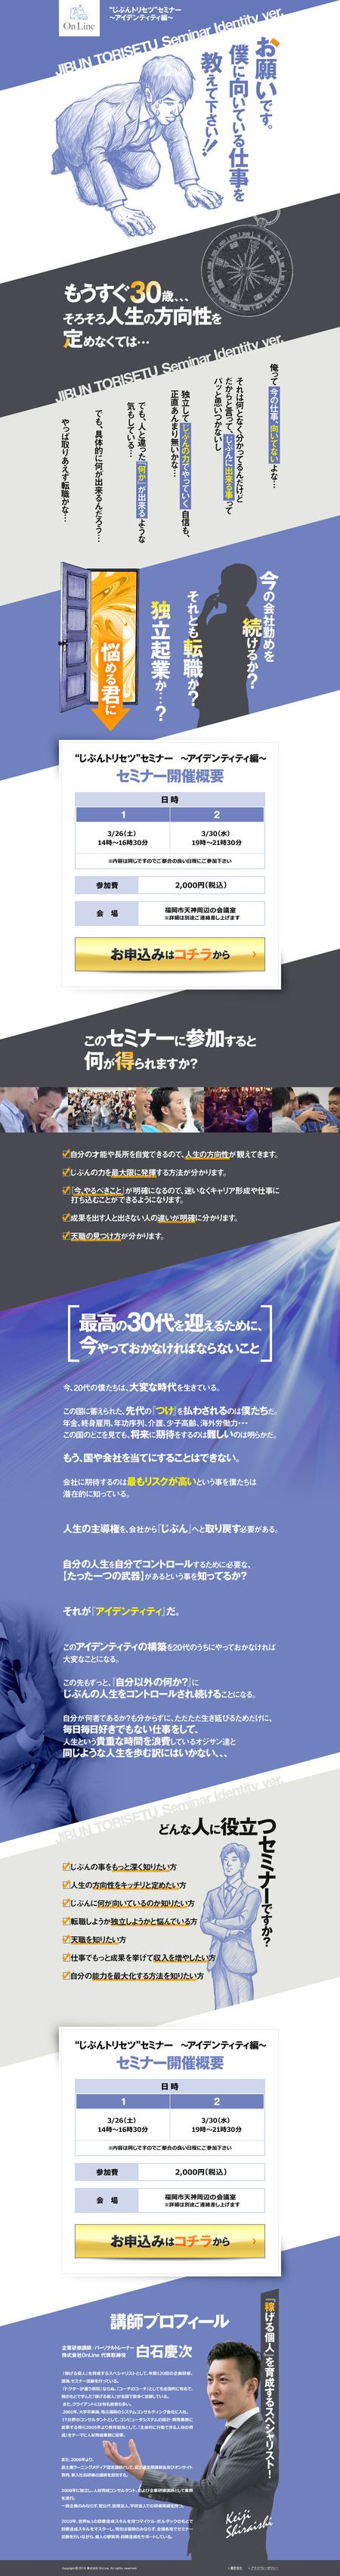 "houtokuさんの提案 - ""じぶんトリセツ""セミナー 〜 アイデンティティ編 〜 のセミナー申込ランディングページ | クラウドソーシング「ランサーズ」"